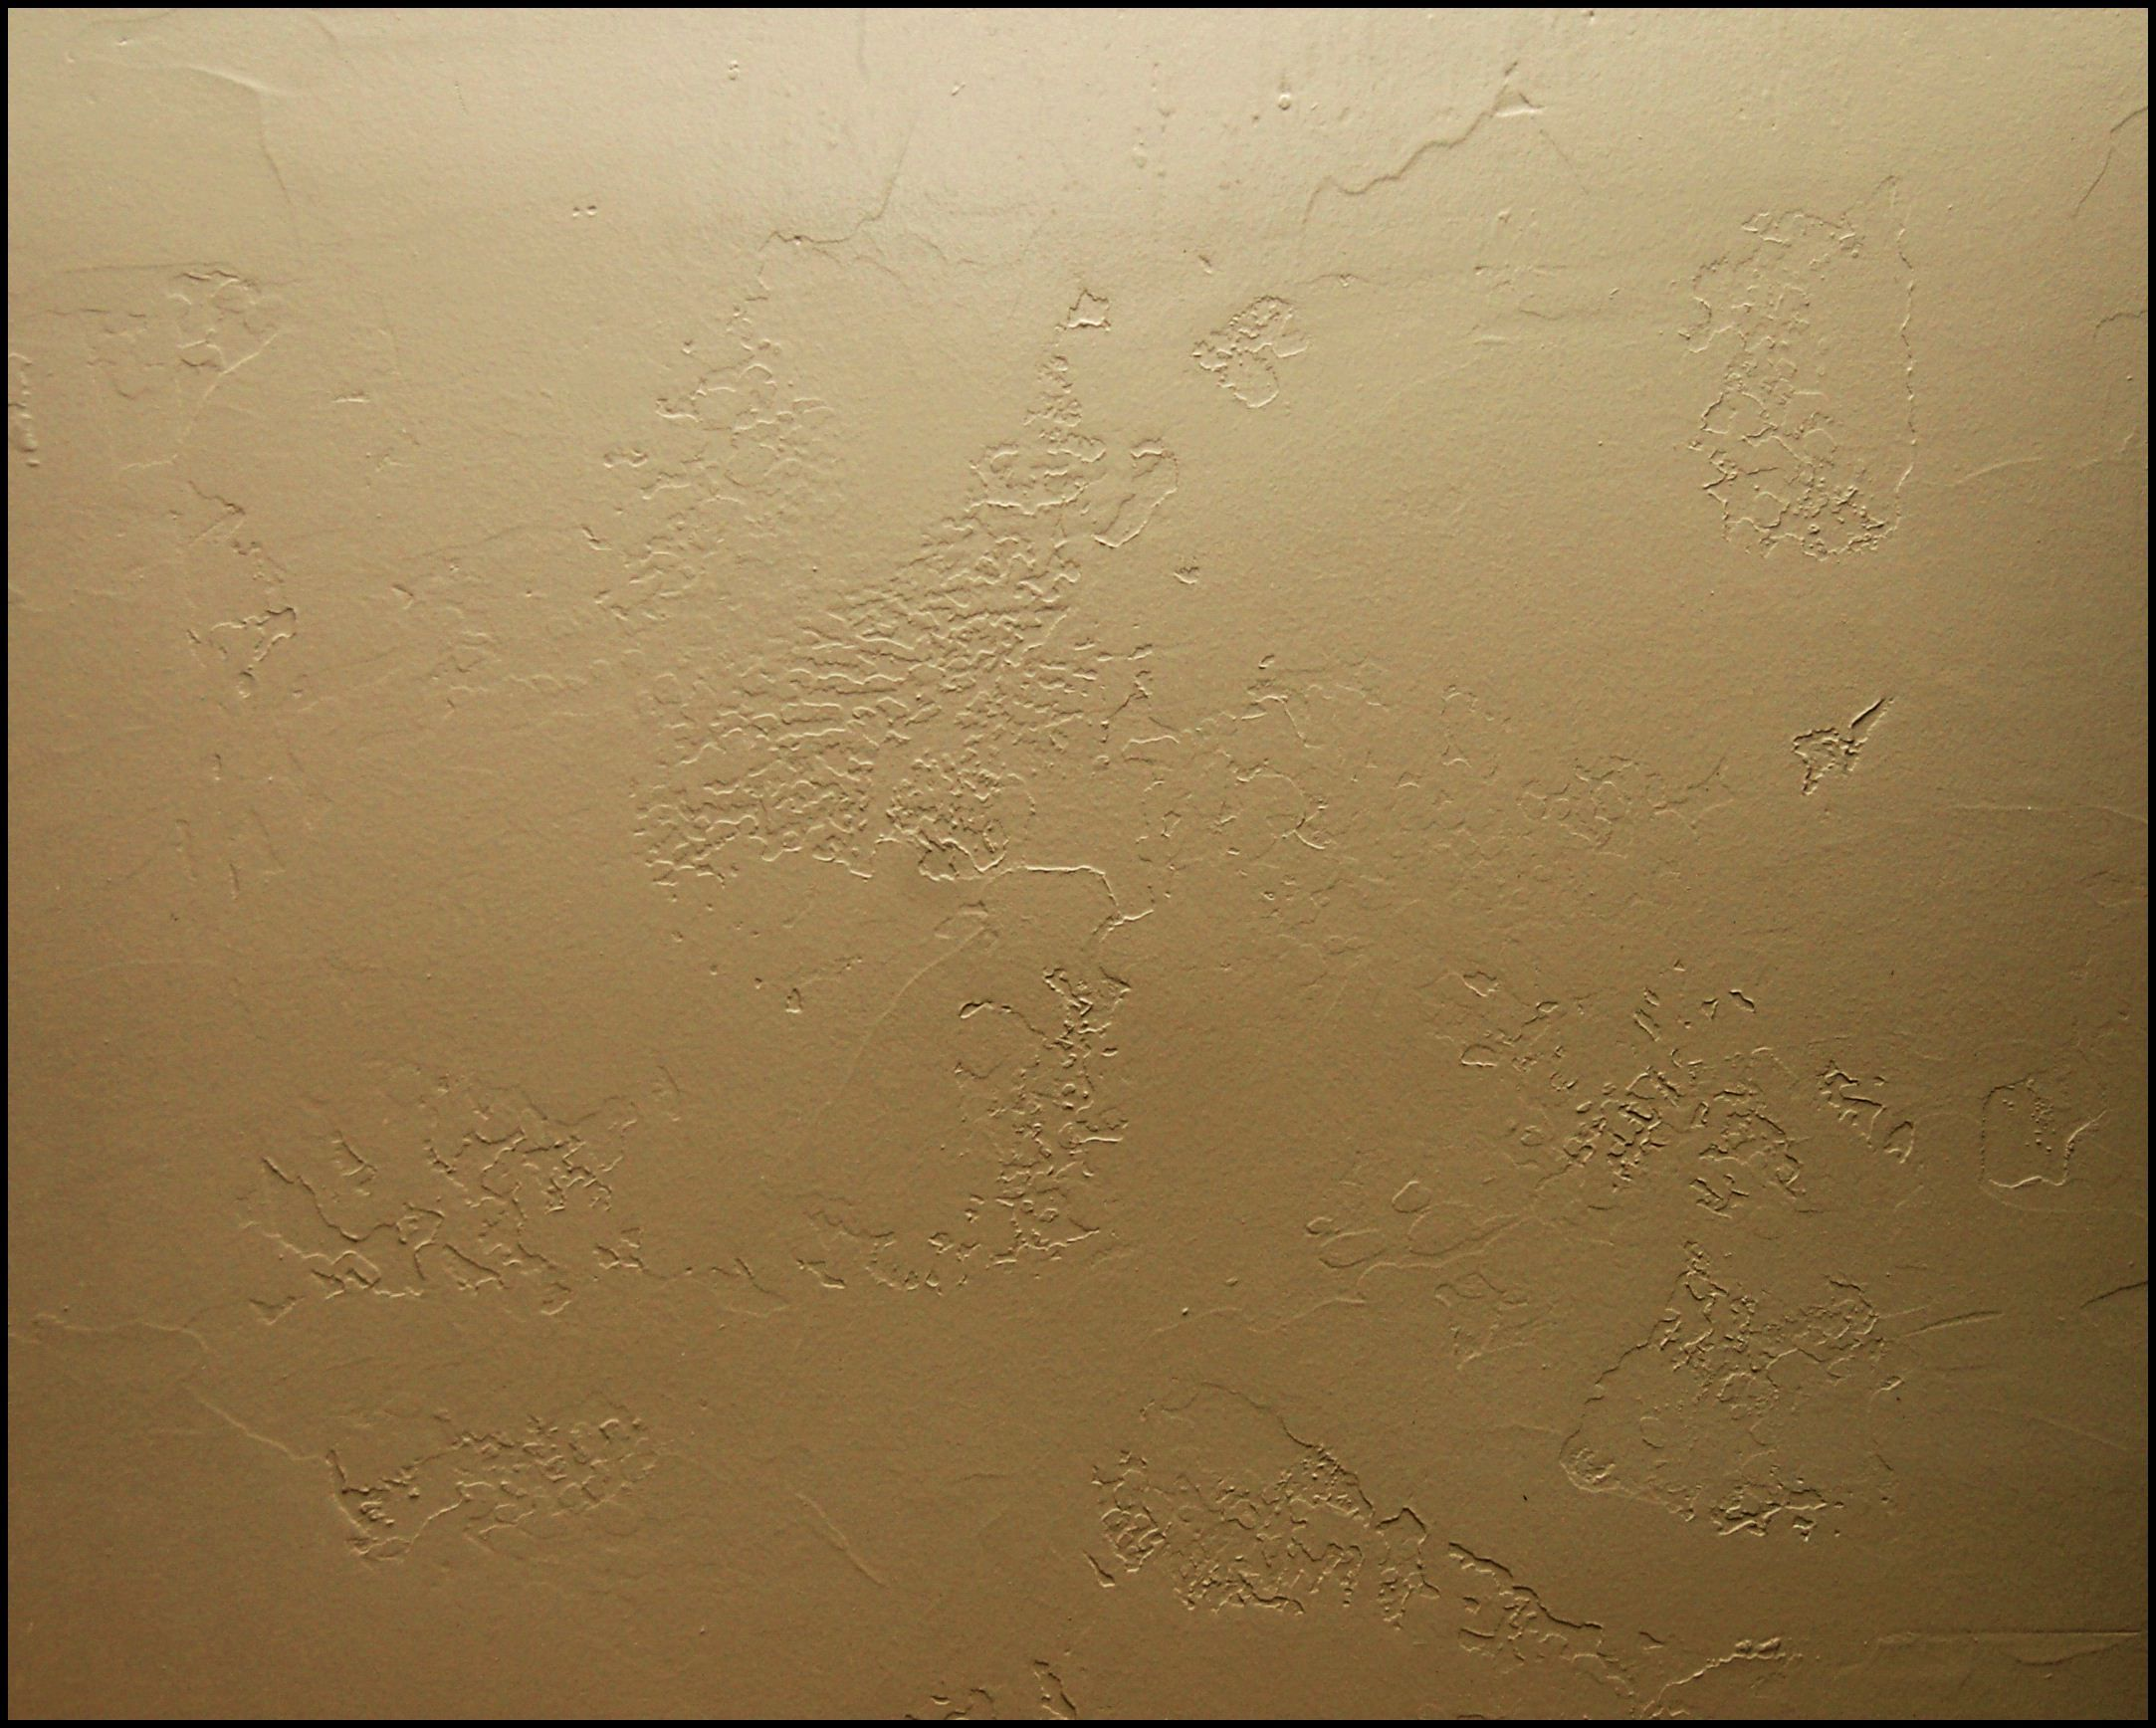 Drywall Texture Skip Trowel Texture Drywall Texture Ceiling Texture Trowel Texture